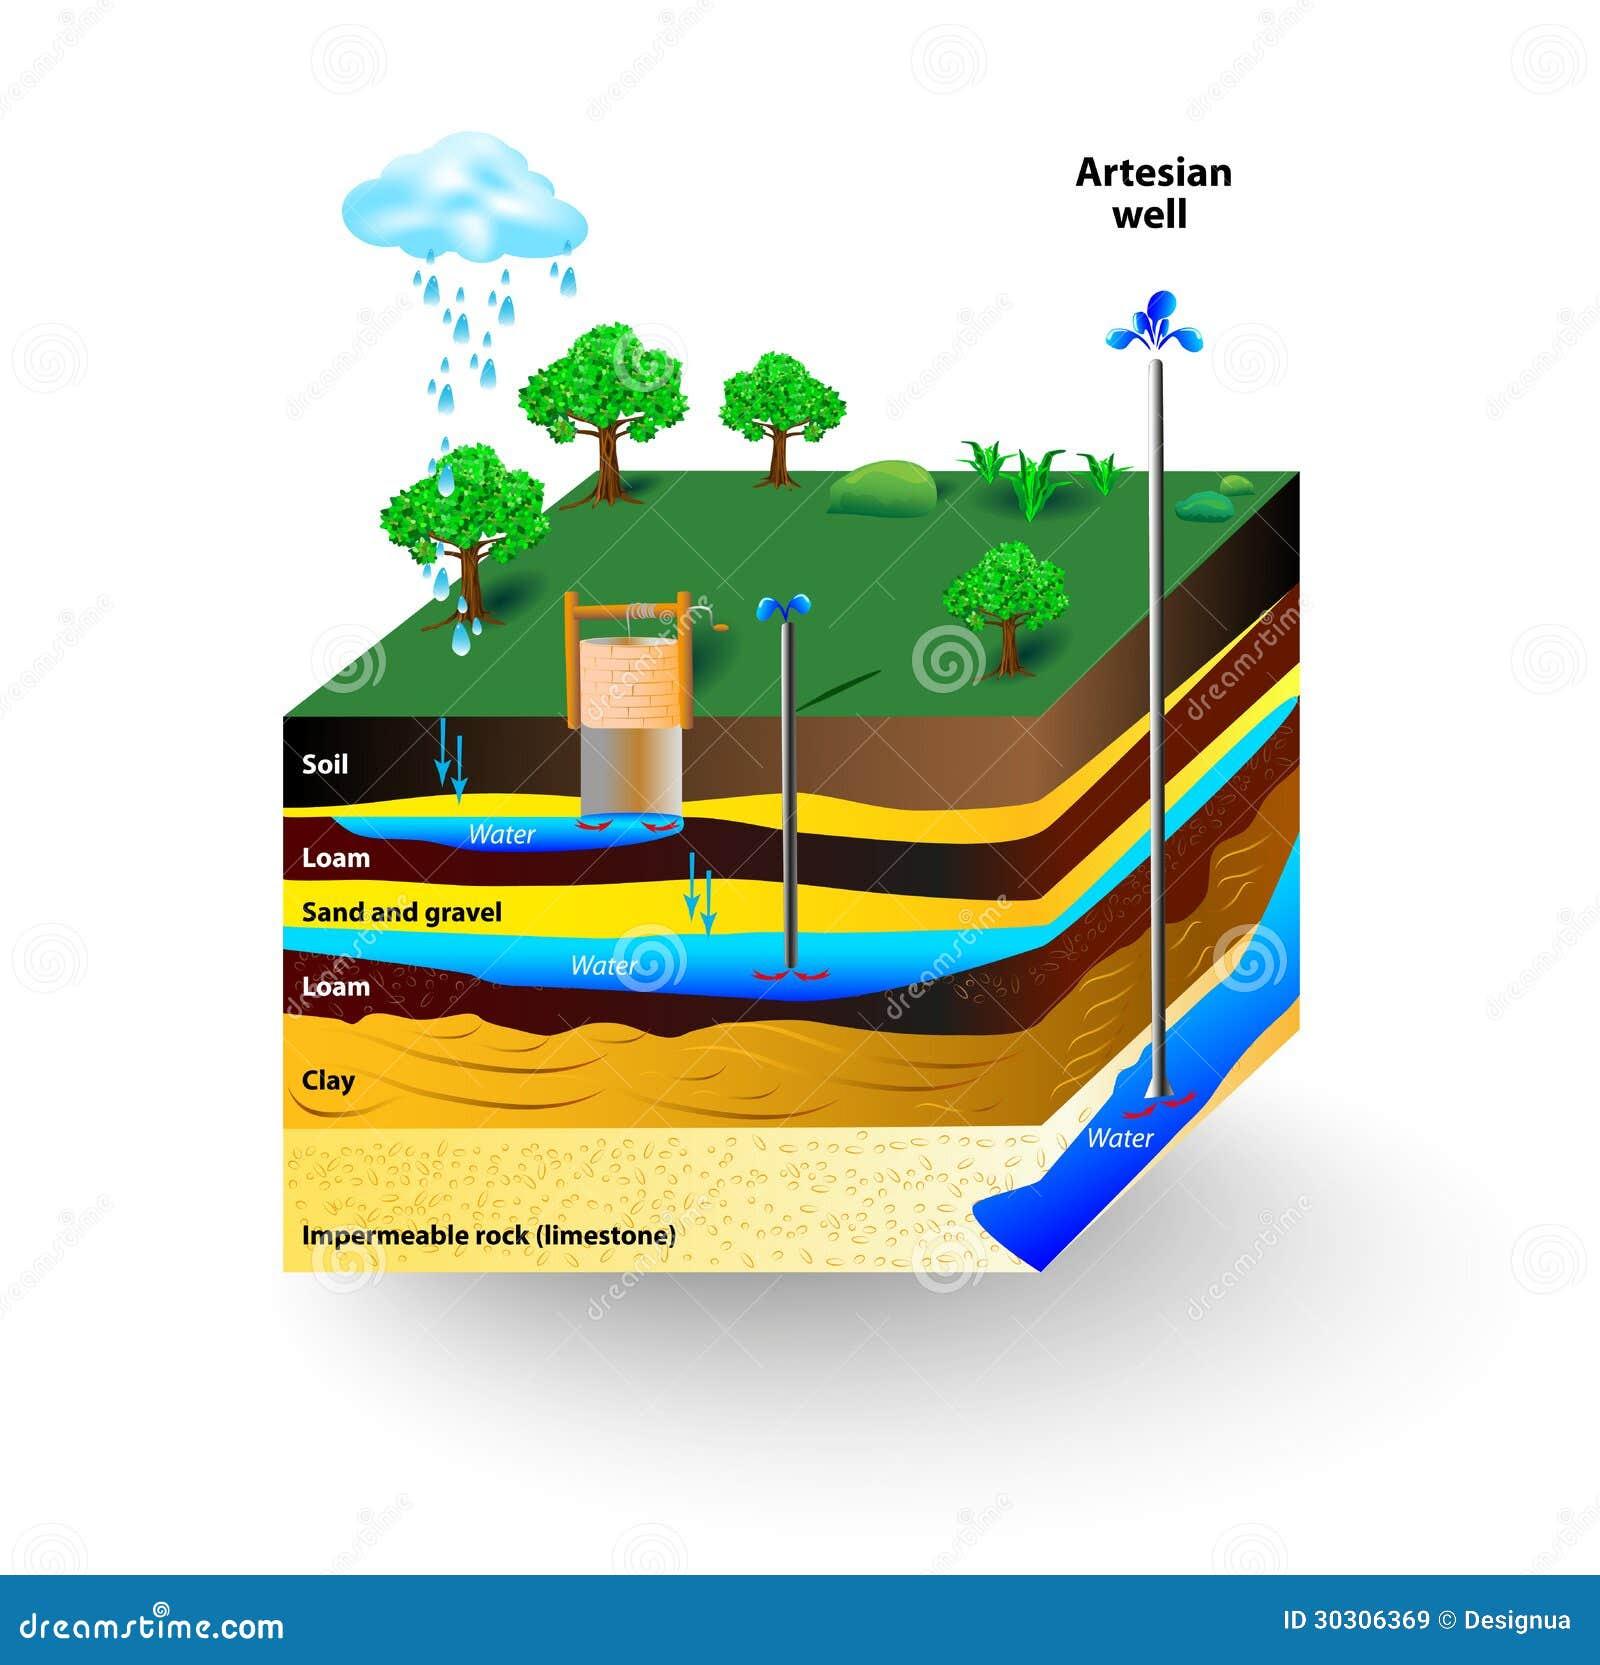 artesian water groundwater schematic artesian well typical aquifer cross section vector diagram 30306369